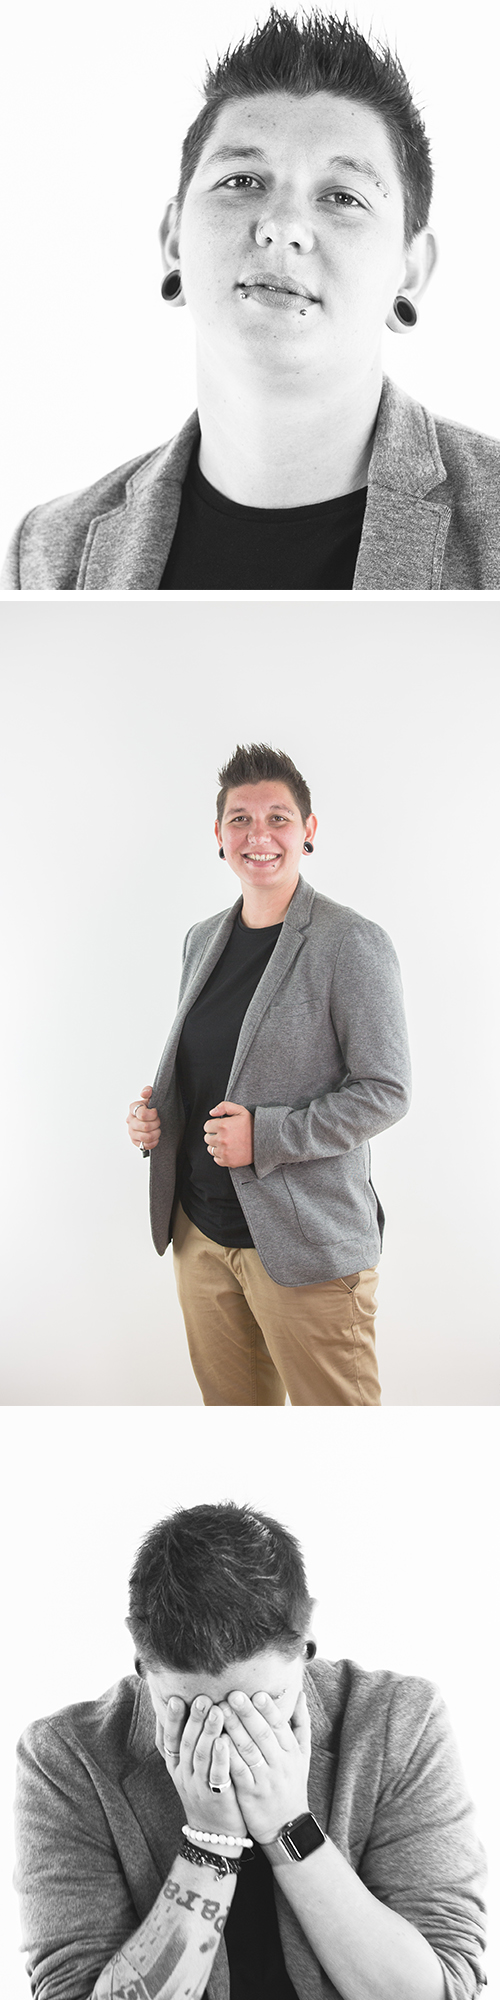 Elea Rossi, Directrice de production aux Studios H2G